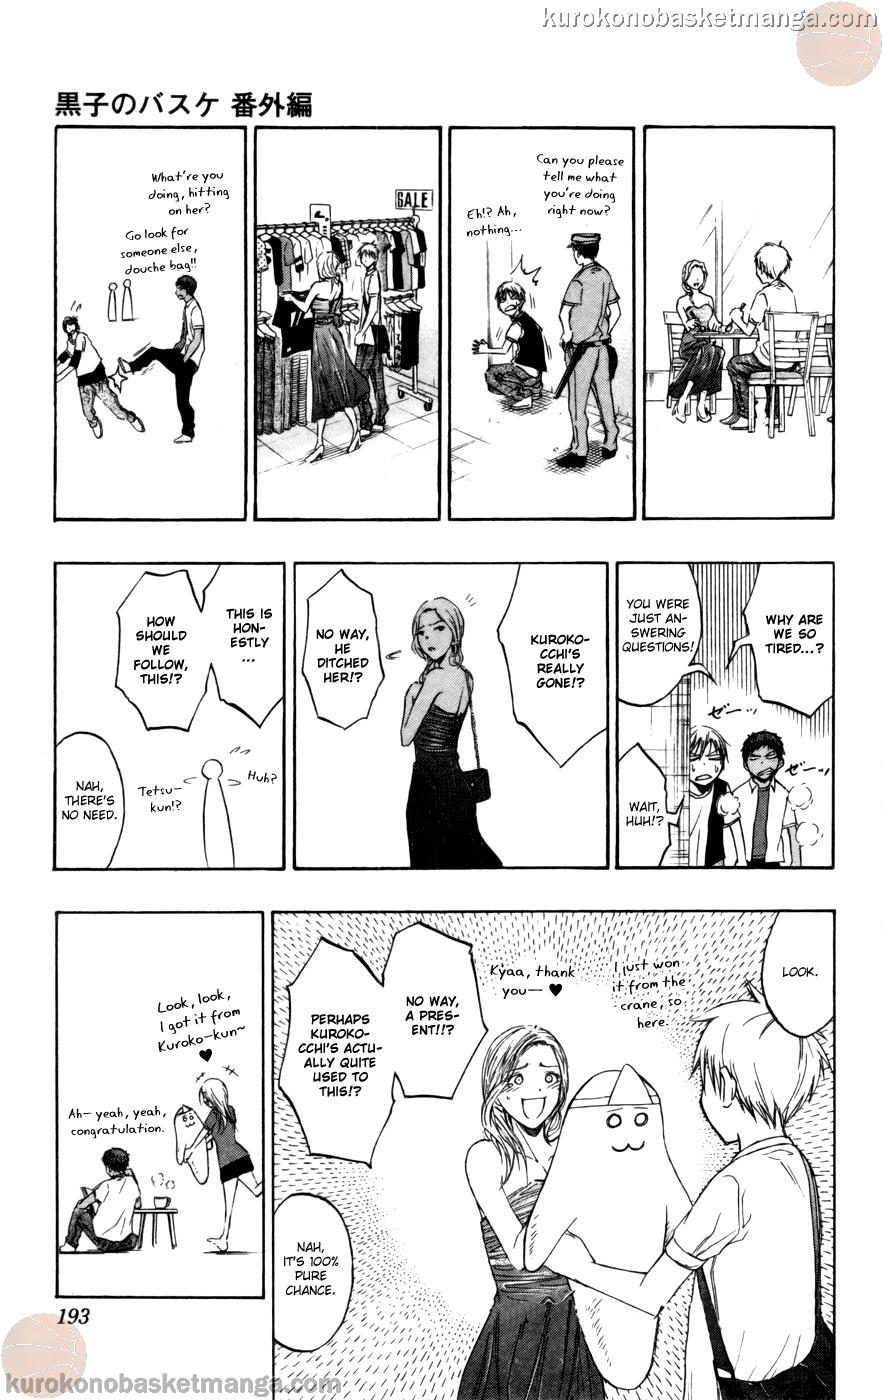 Kuroko no Basket Manga Chapter 108 - Image 22